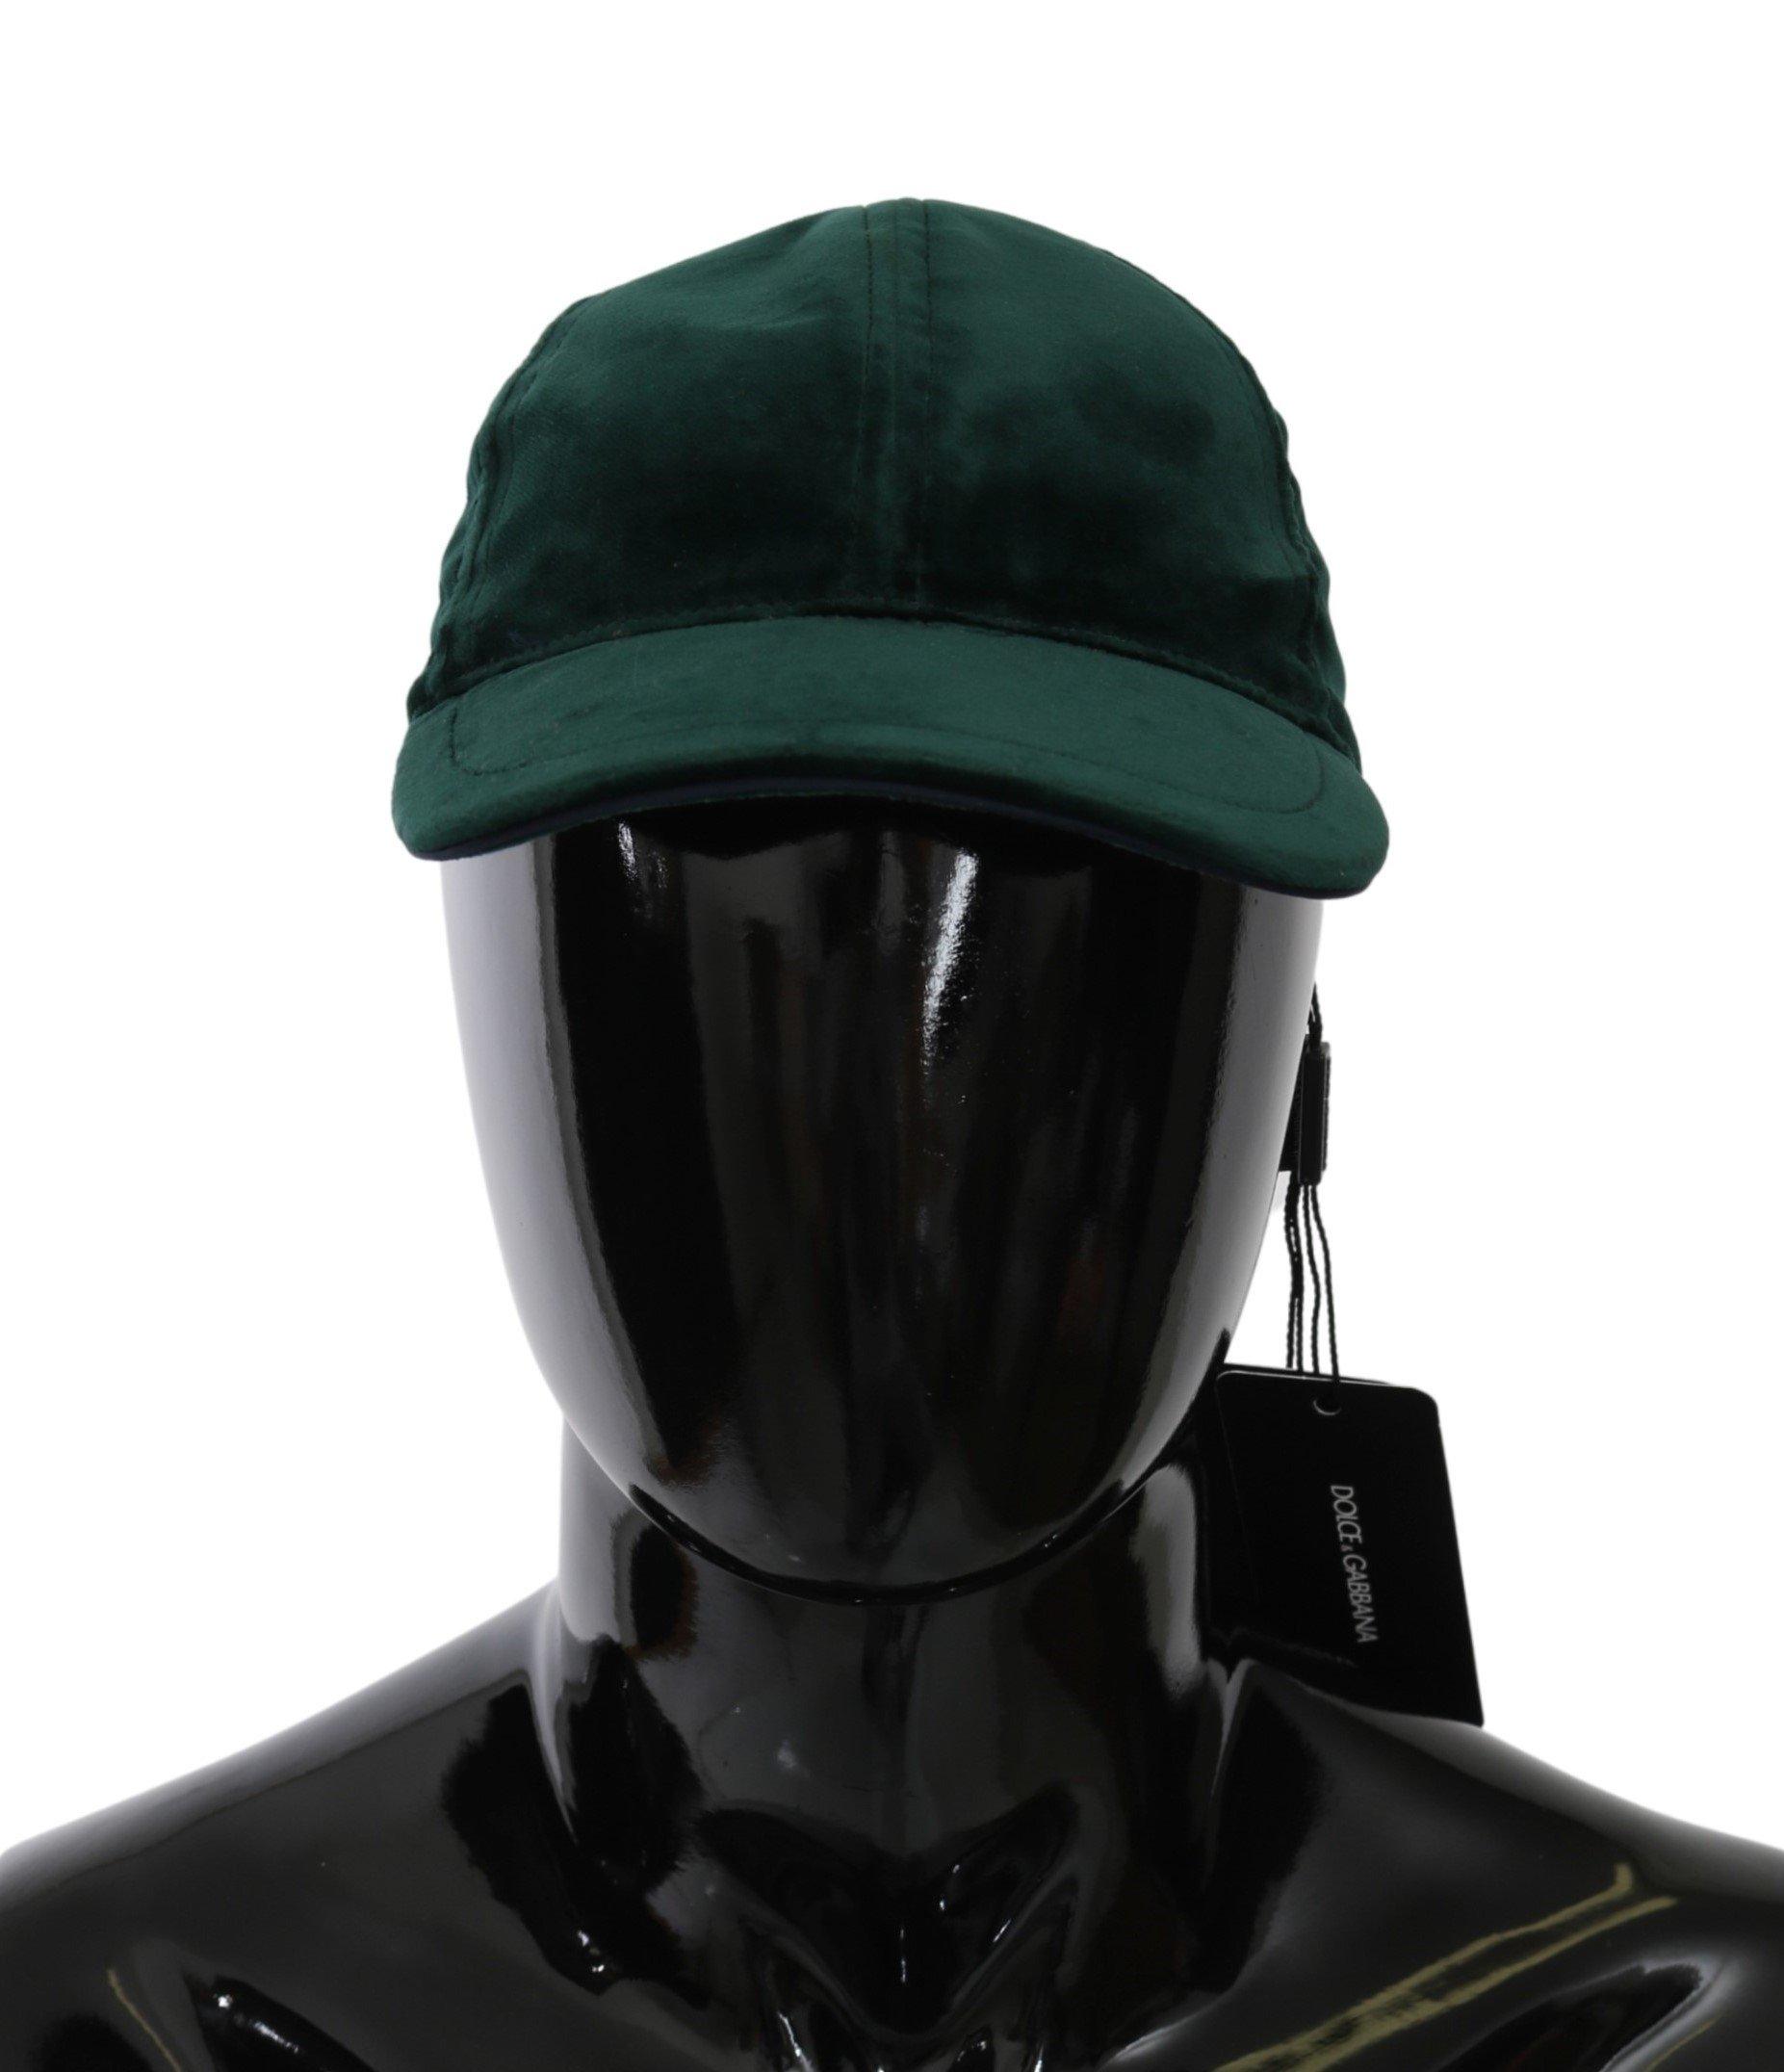 Dolce & Gabbana Men's Suede Baseball Cap Green HAT20071 - 57 cm|S